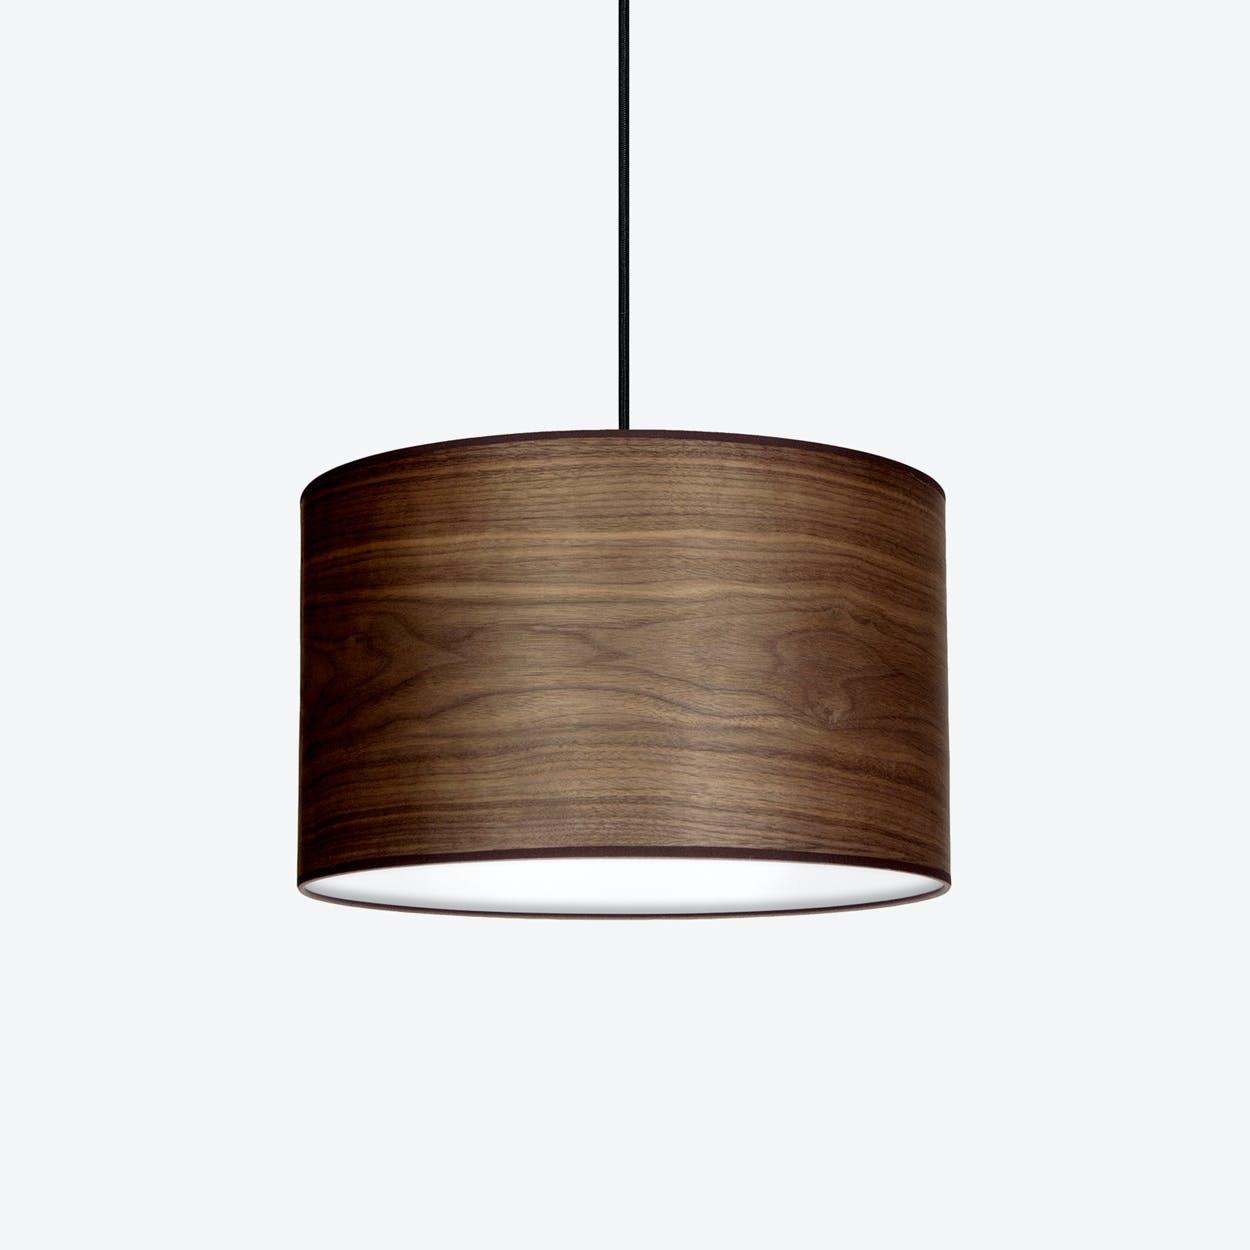 TSURI Large Single Pendant Light in Walnut